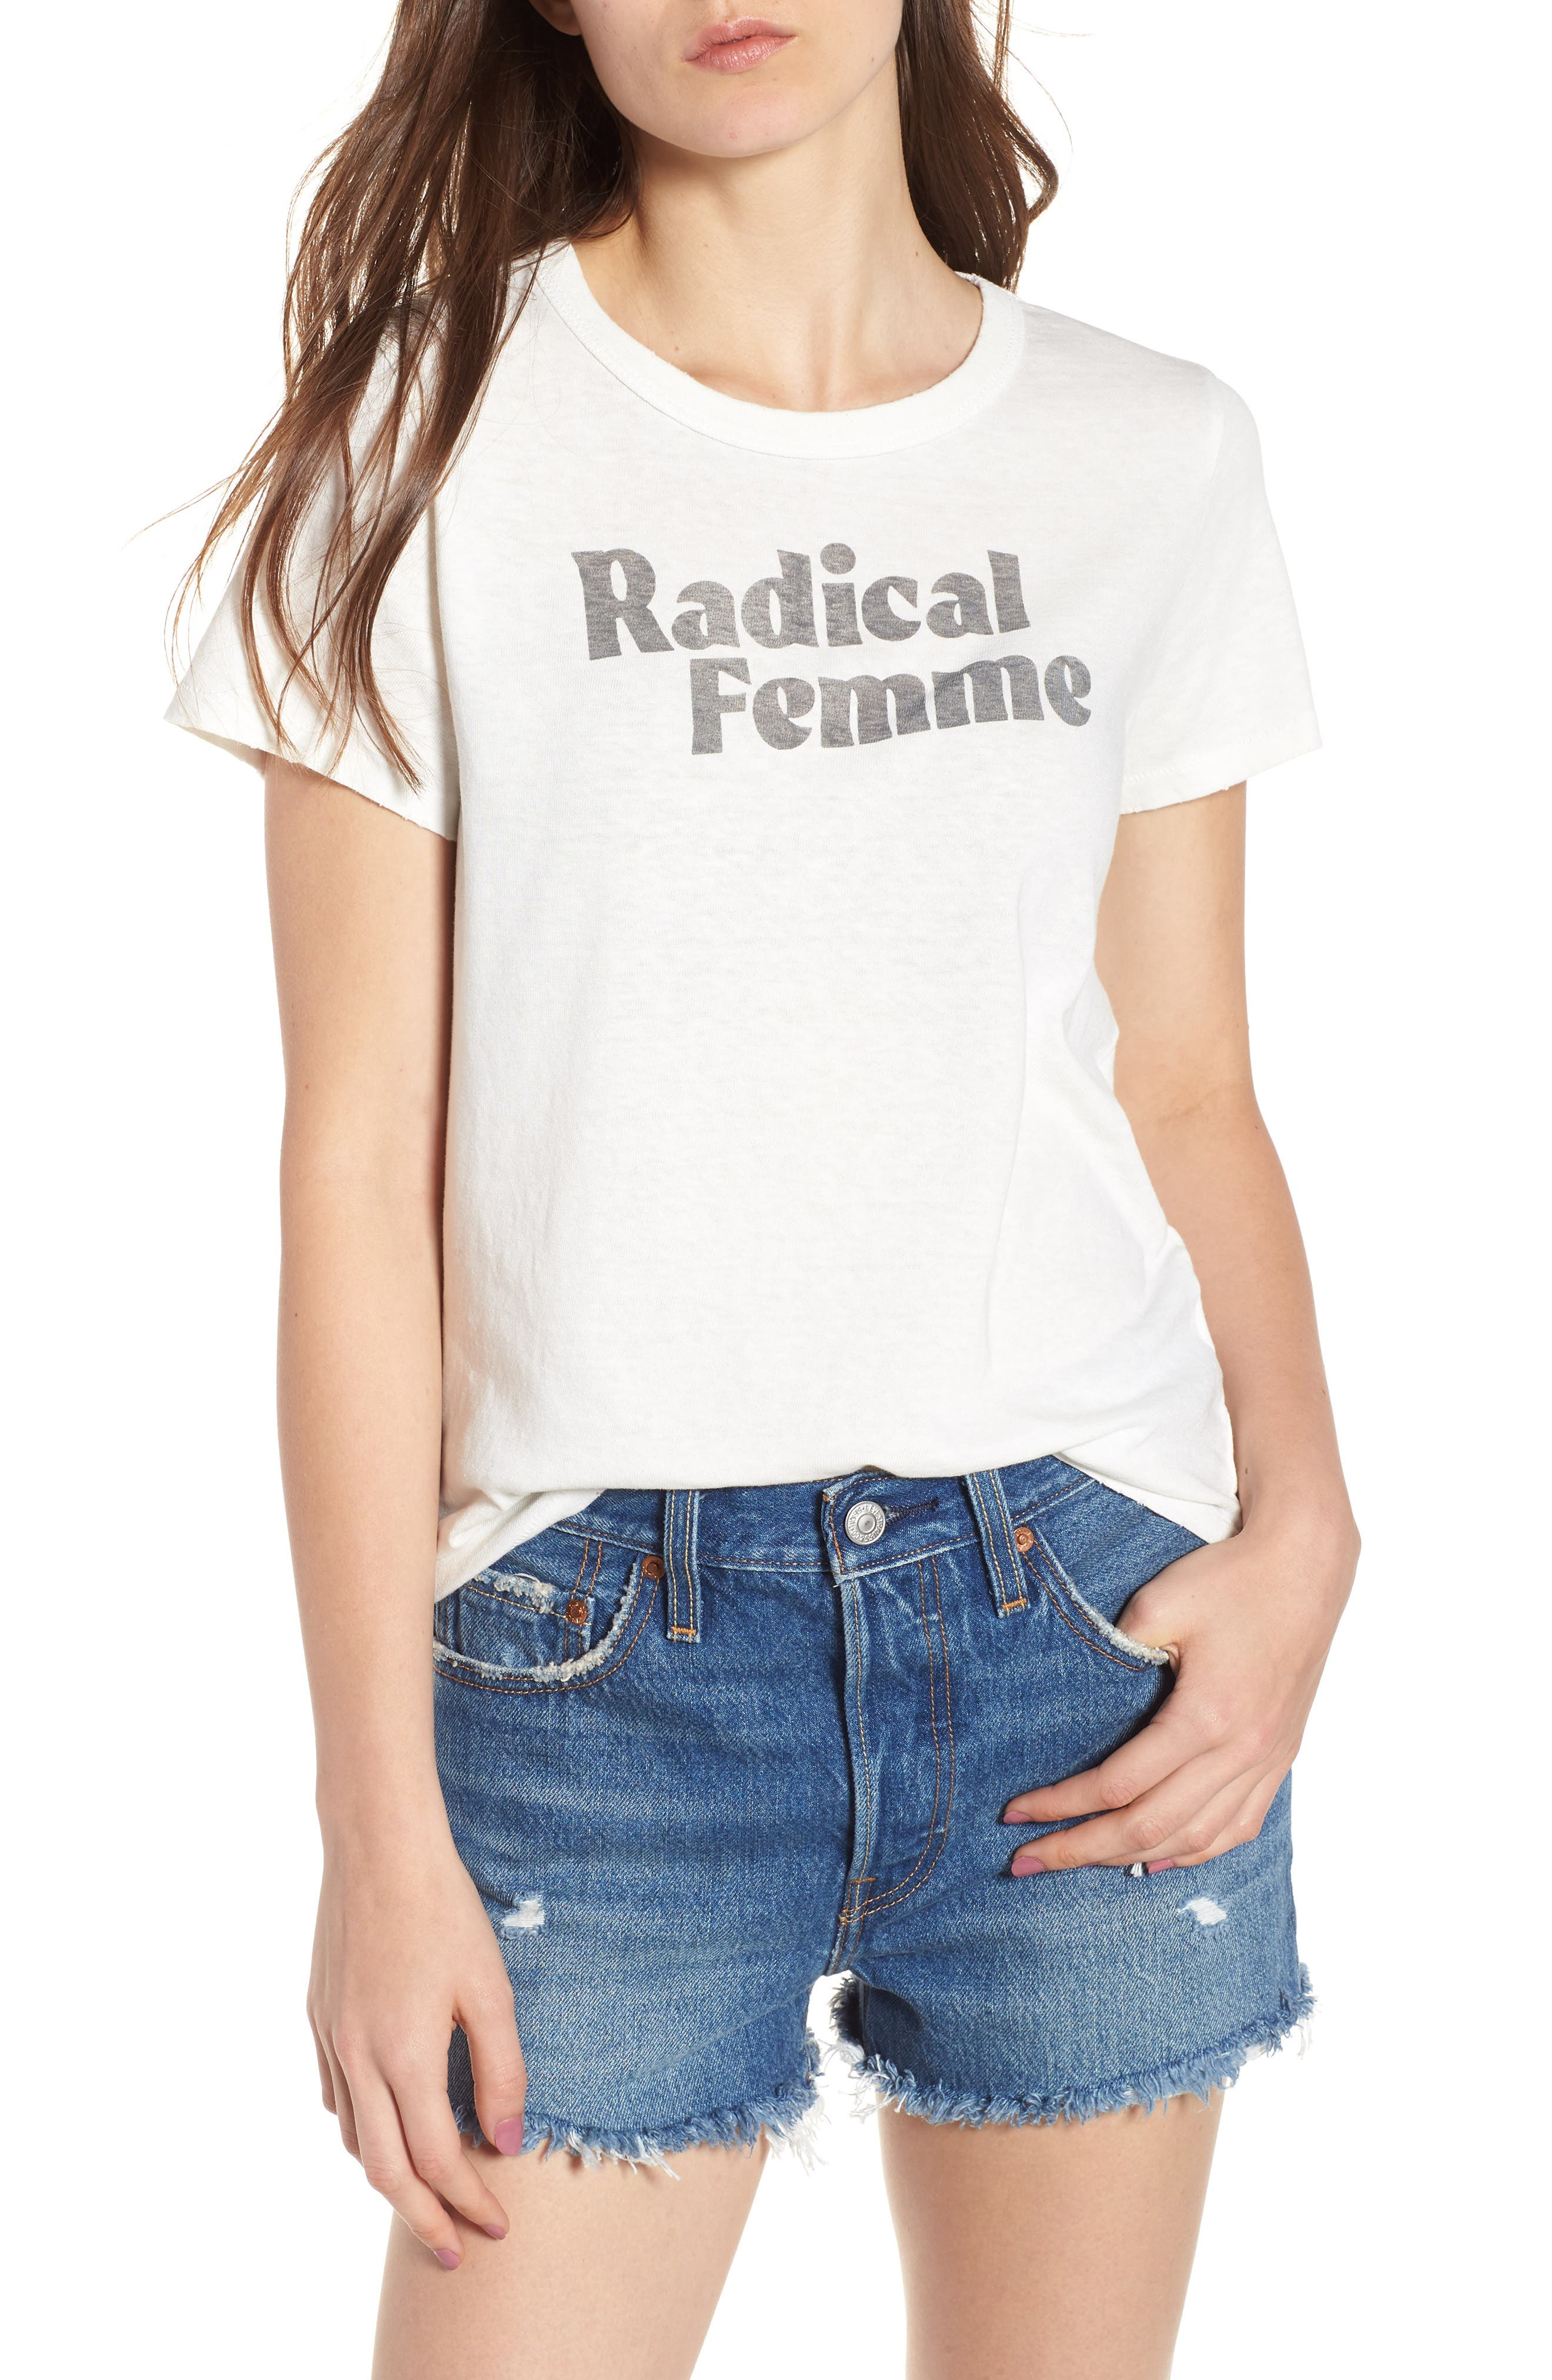 Radical Femme Tee,                             Main thumbnail 1, color,                             110